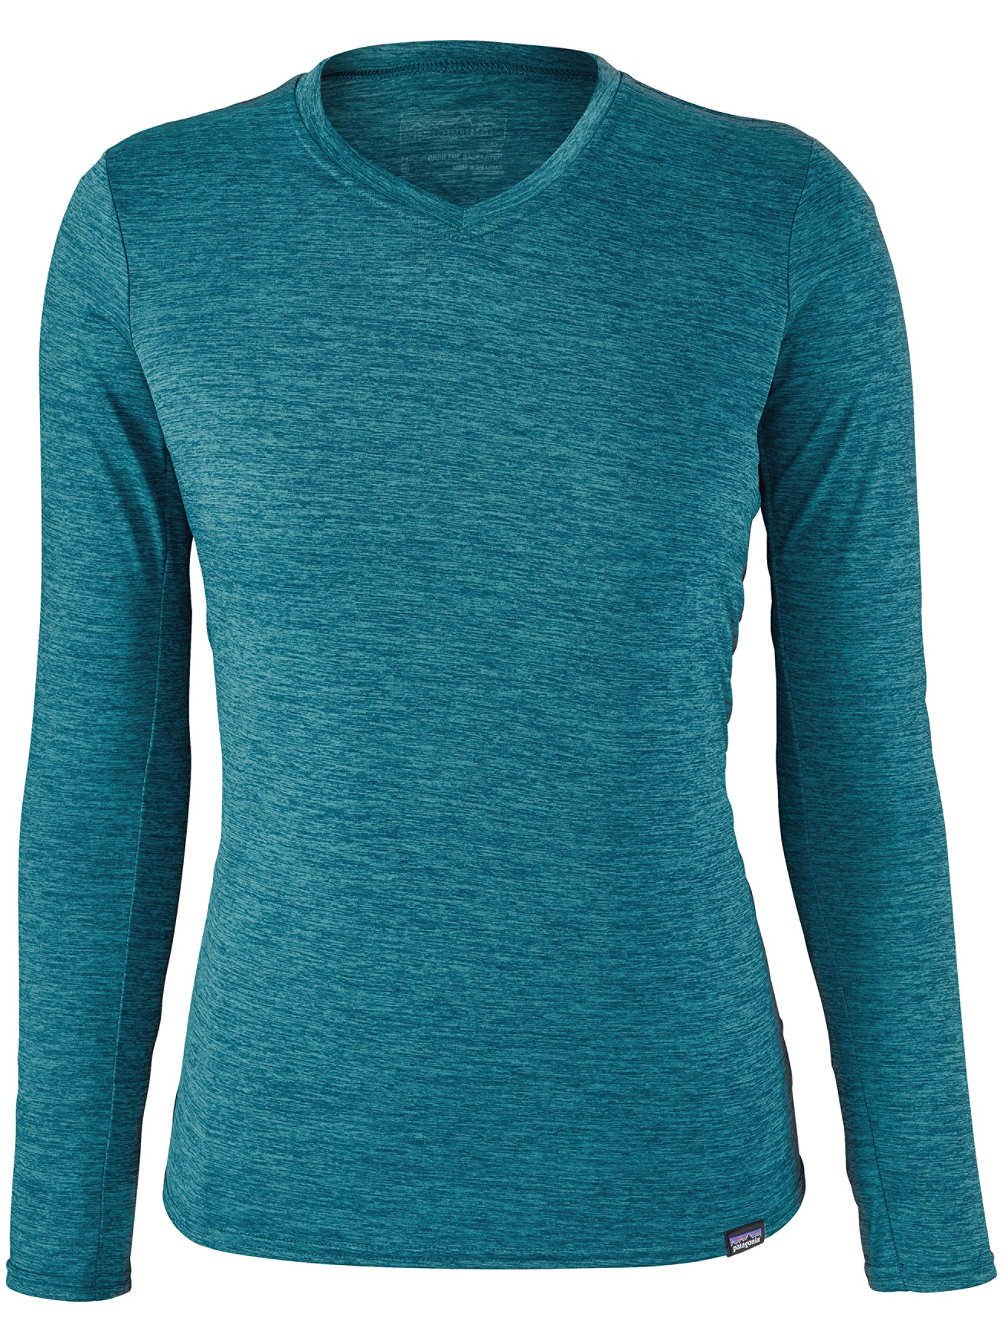 Patagonia Women's Capilene Daily Long-Sleeved T-Shirt - Elwha Blue Navy Blue X-Dye - Medium by Patagonia